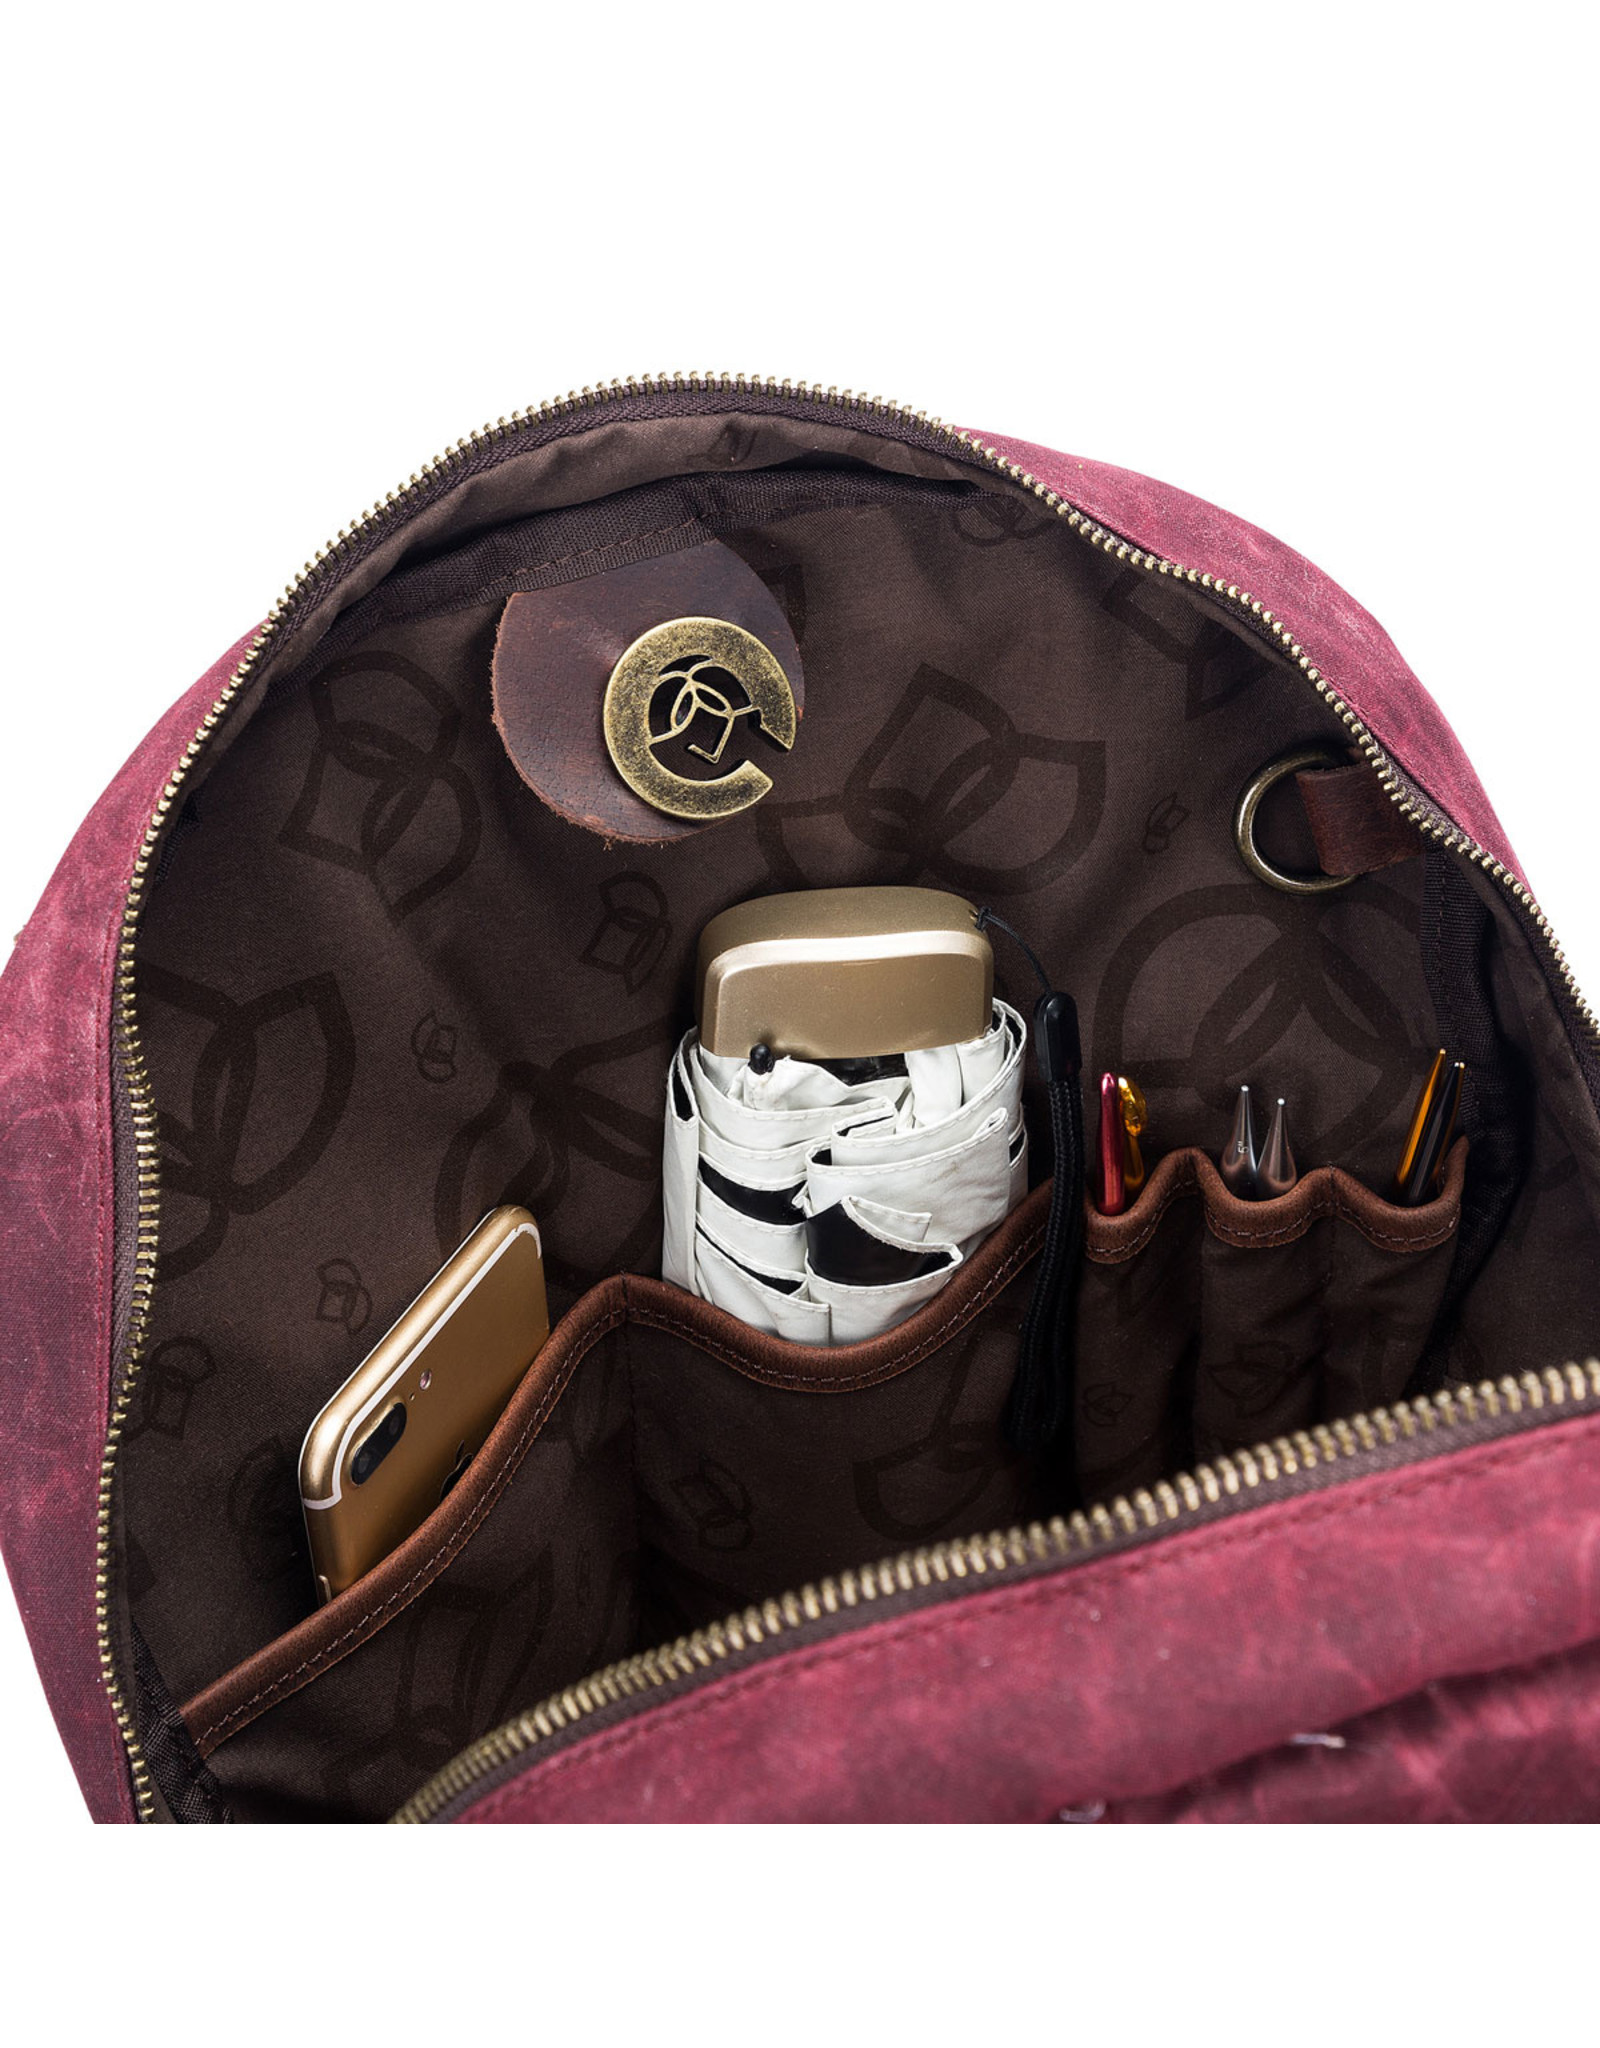 Della Q Della Q Maker's Canvas Backpack